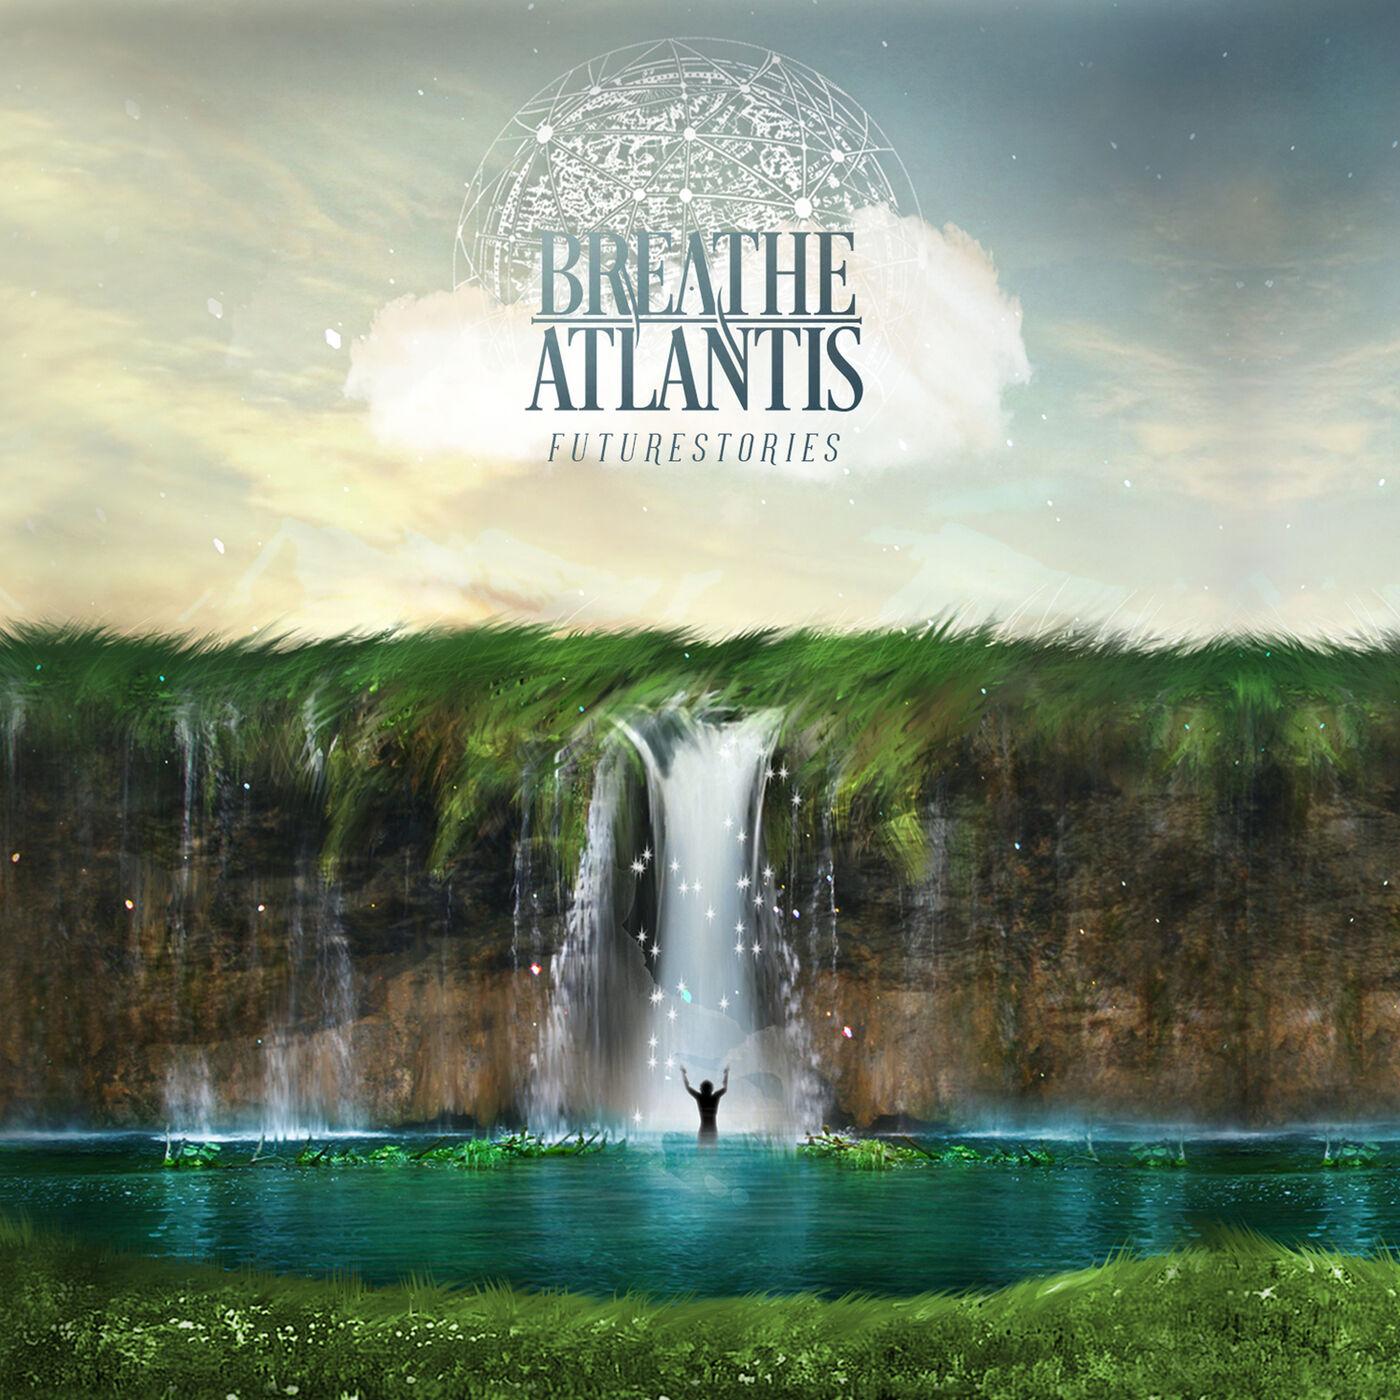 Breathe Atlantis - Perfection [single] (2016)